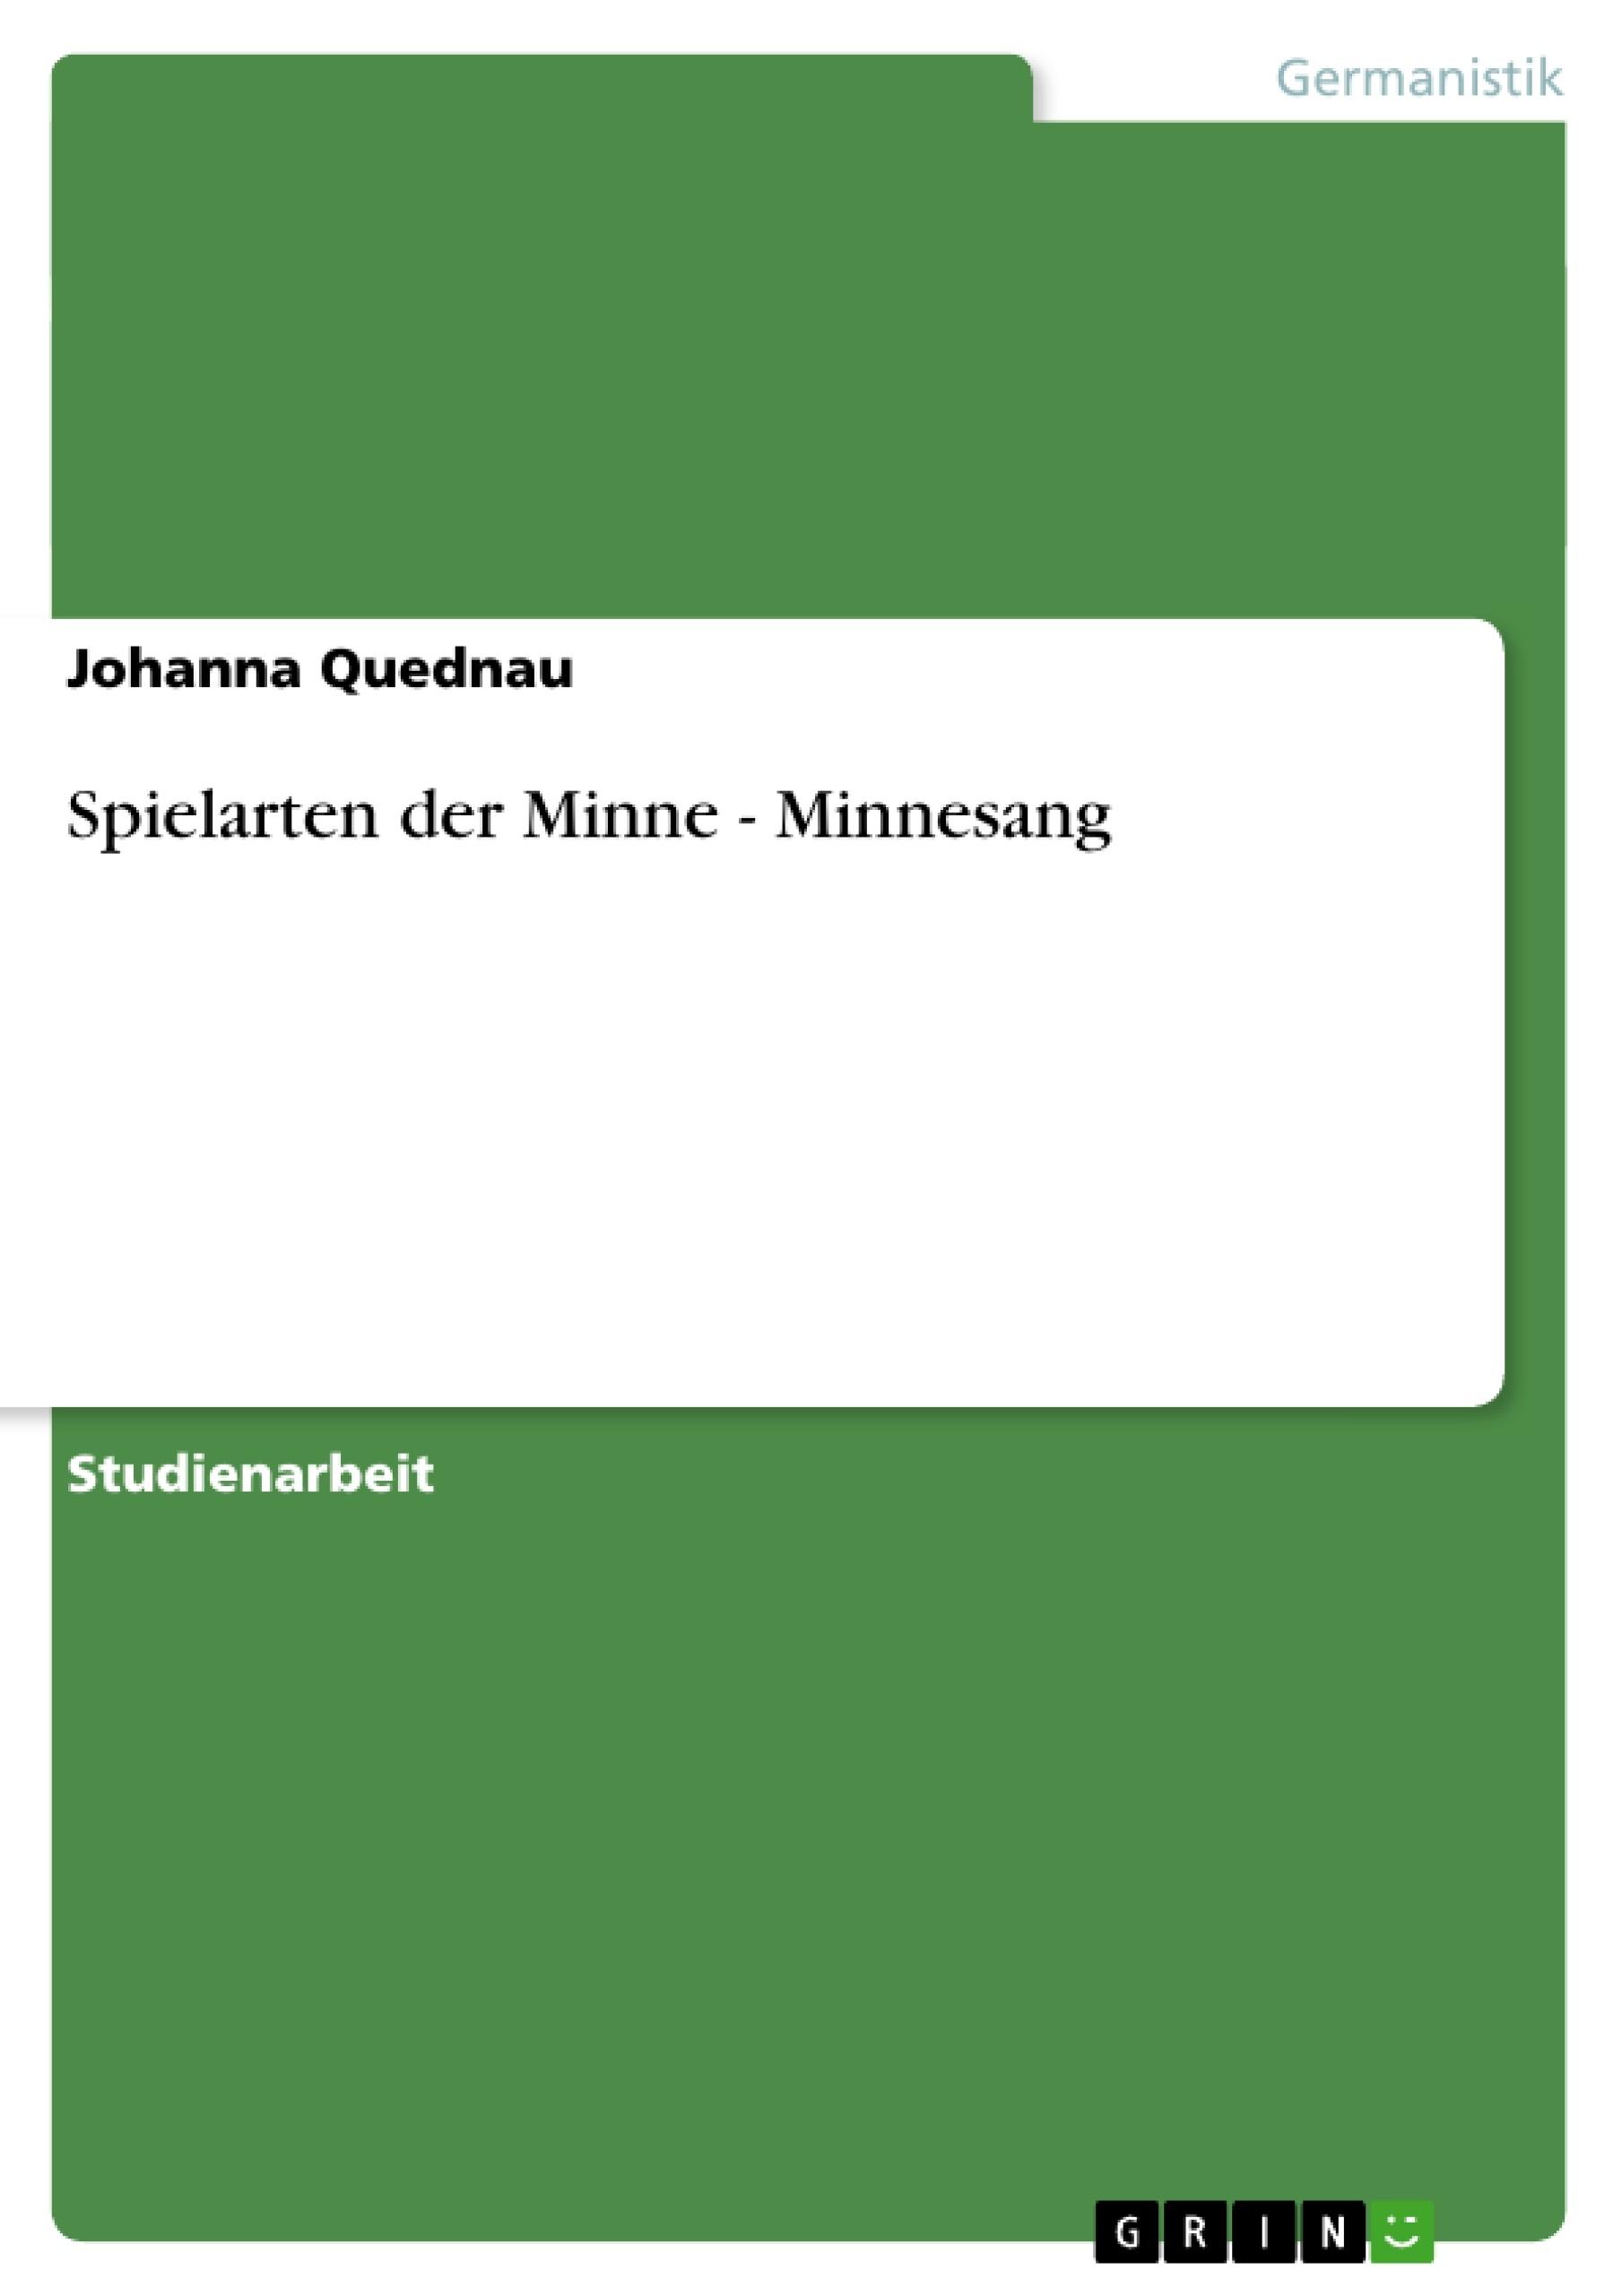 Titel: Spielarten der Minne - Minnesang